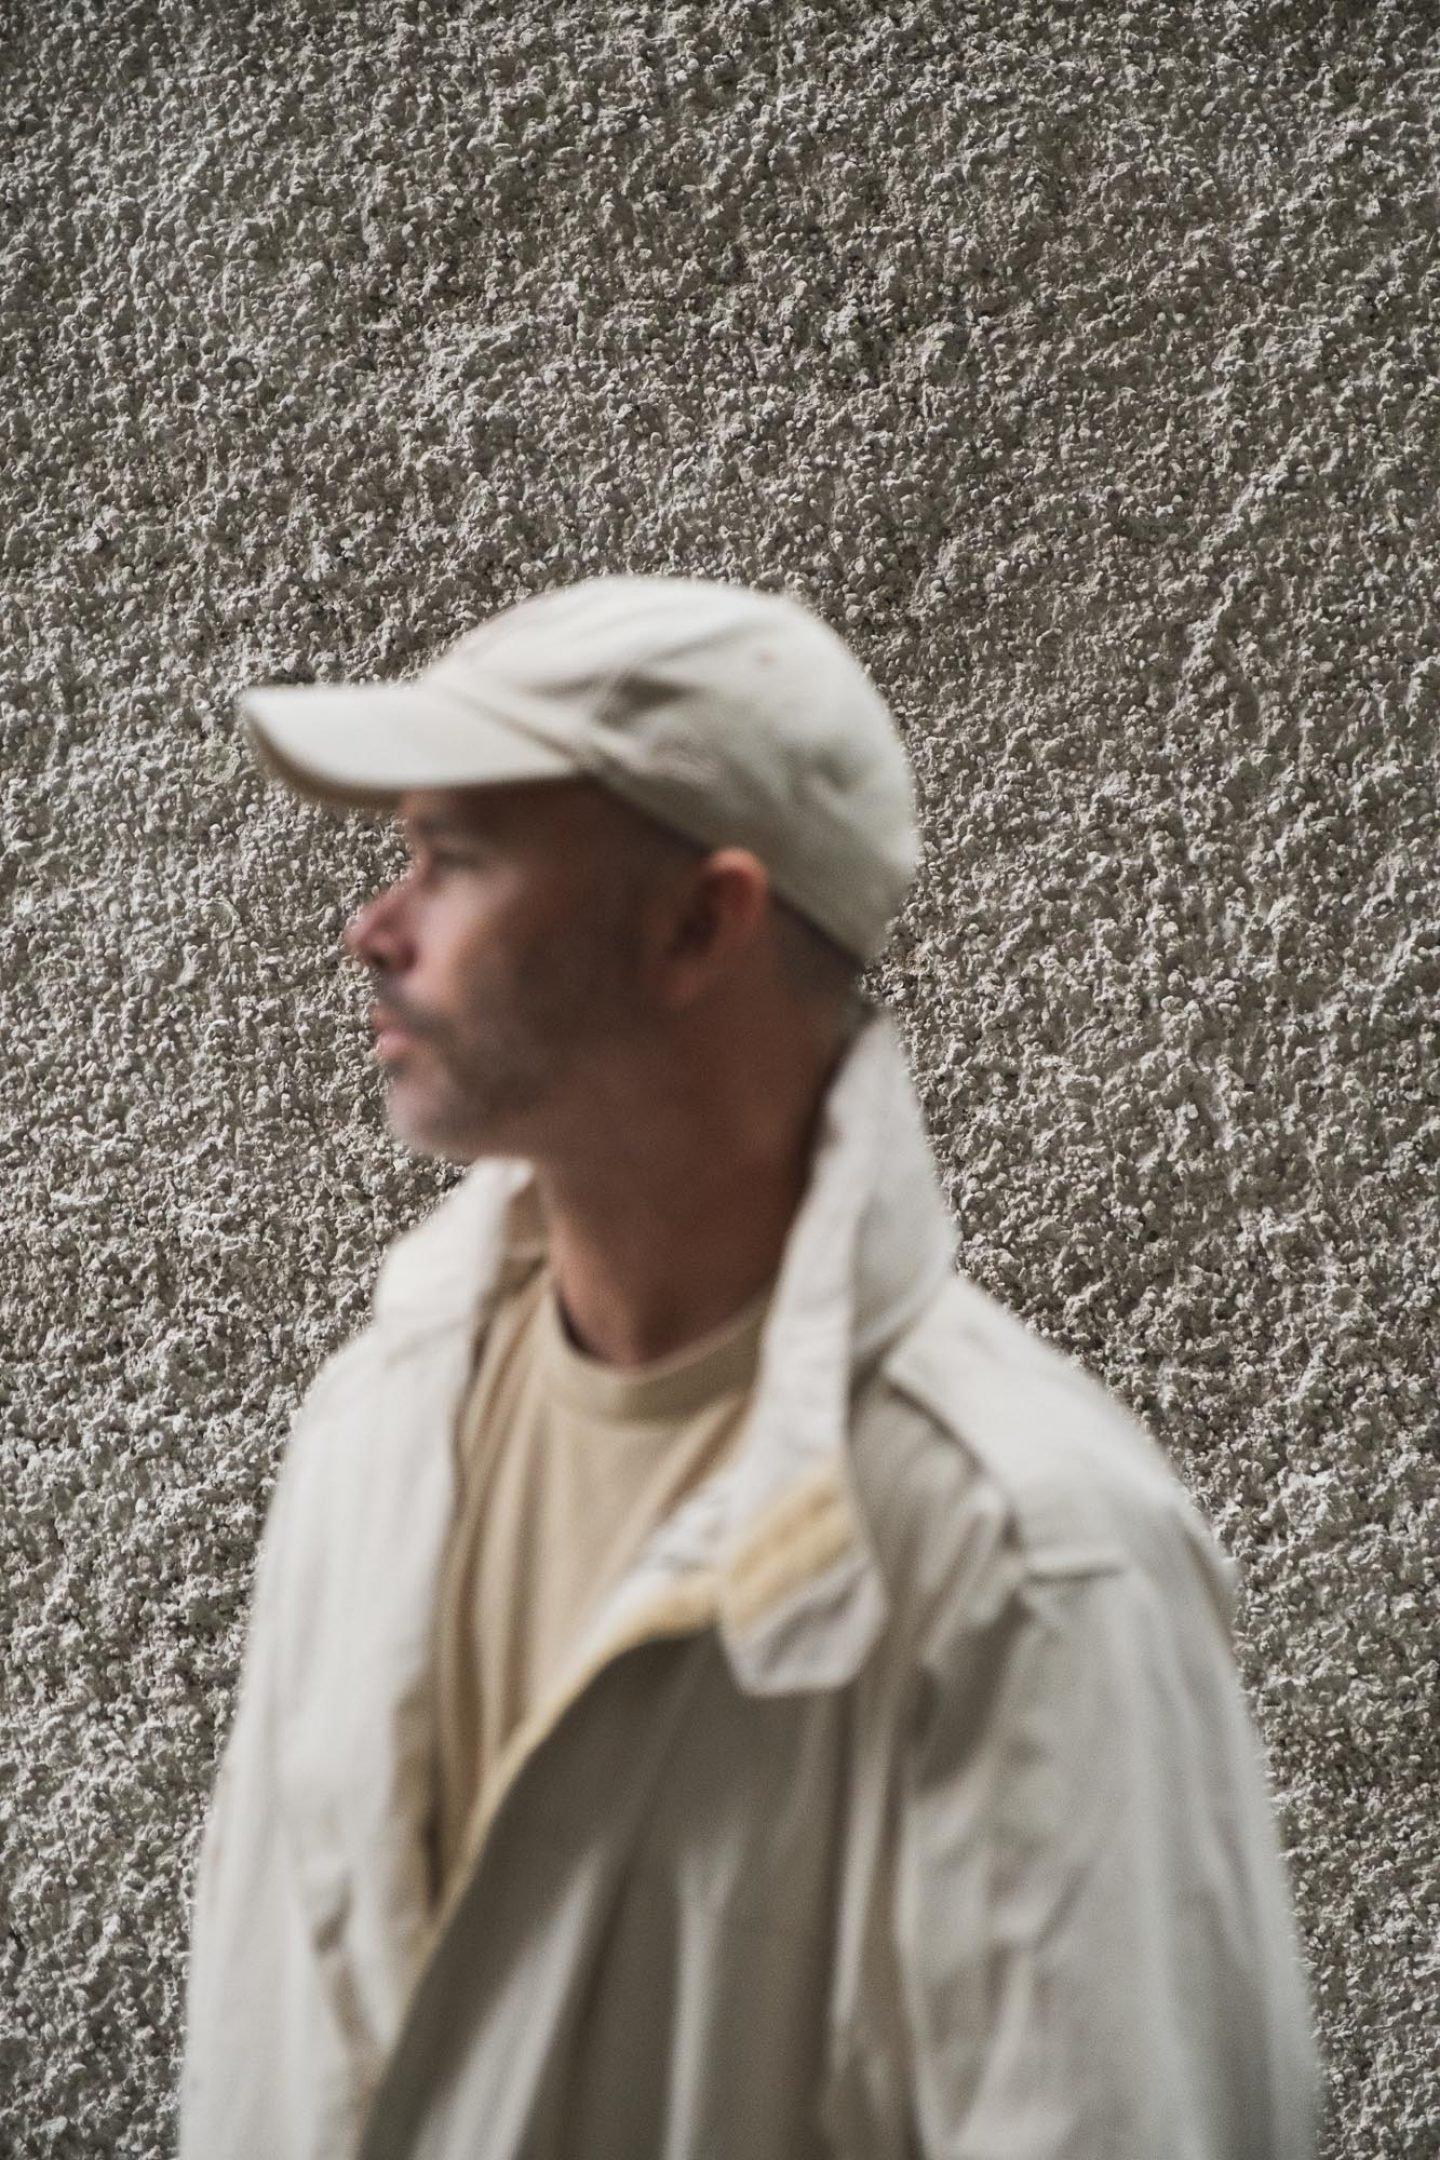 Daniel-Arsham-Koenig-Galerie-Clemens-Poloczek-IGNANT-003